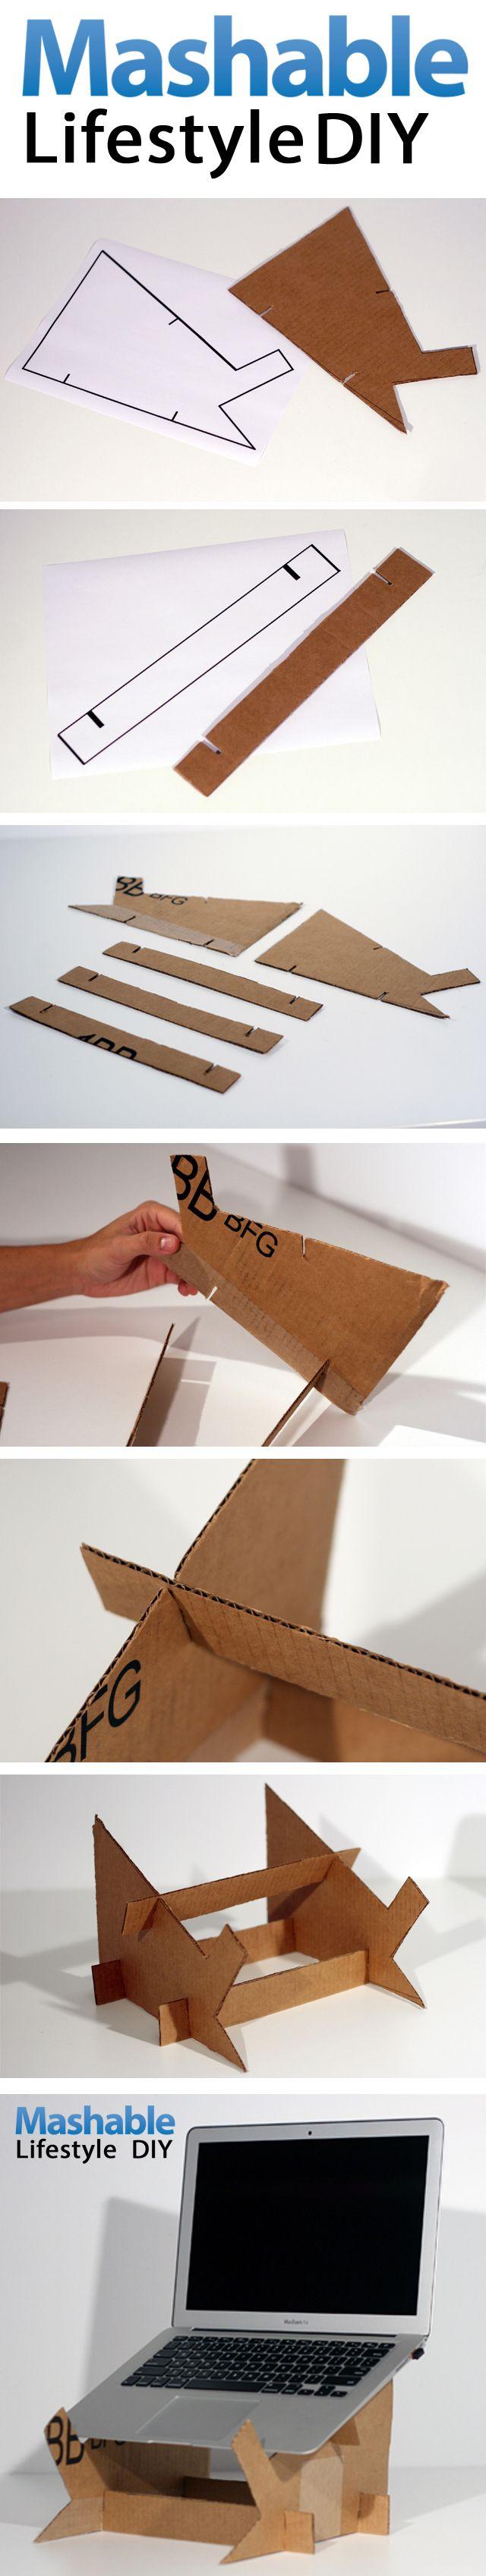 Diy cardboard laptop stand maddox tan.